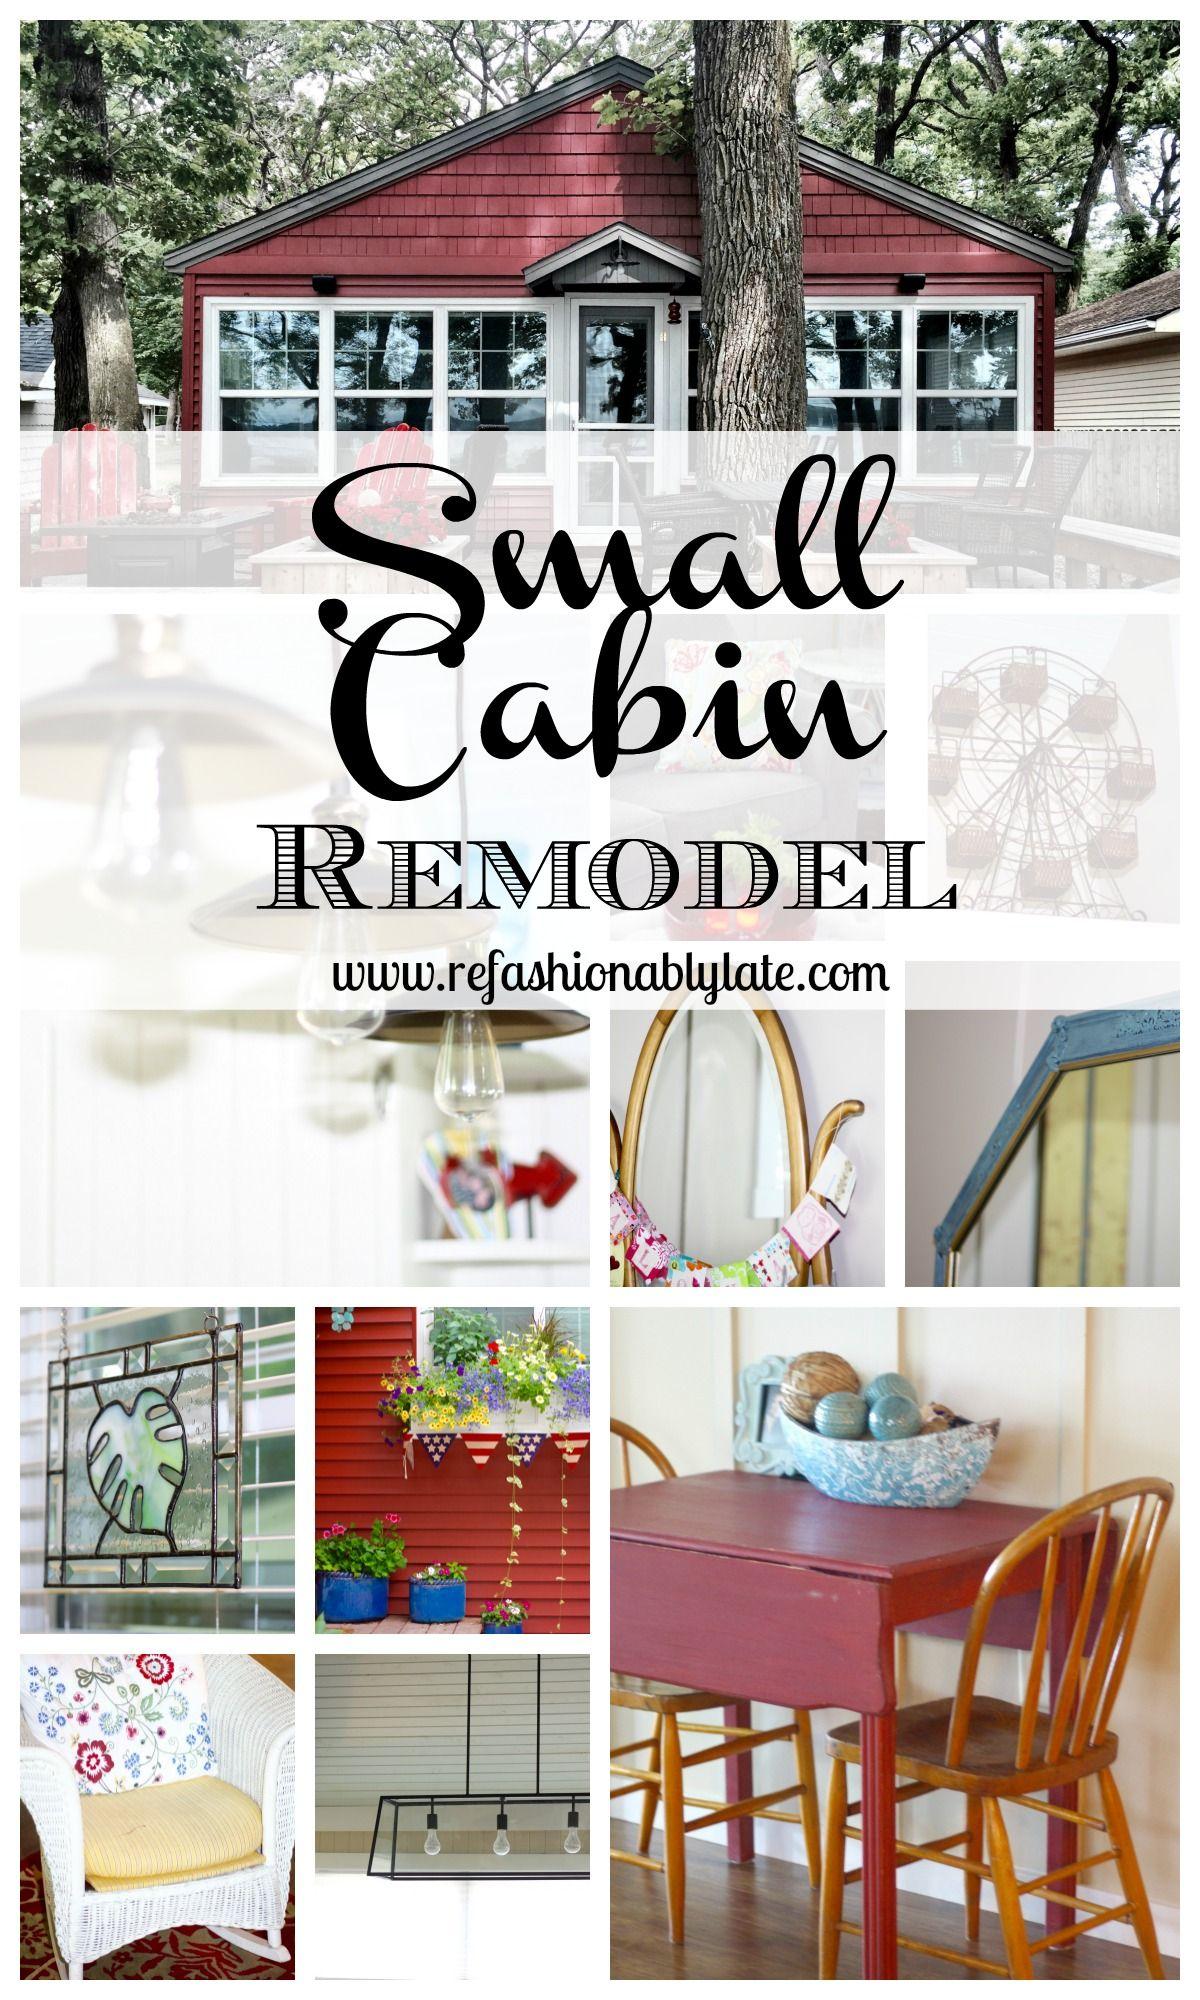 Small Cabin Remodel Small Cabin Remodel Cabin Decor